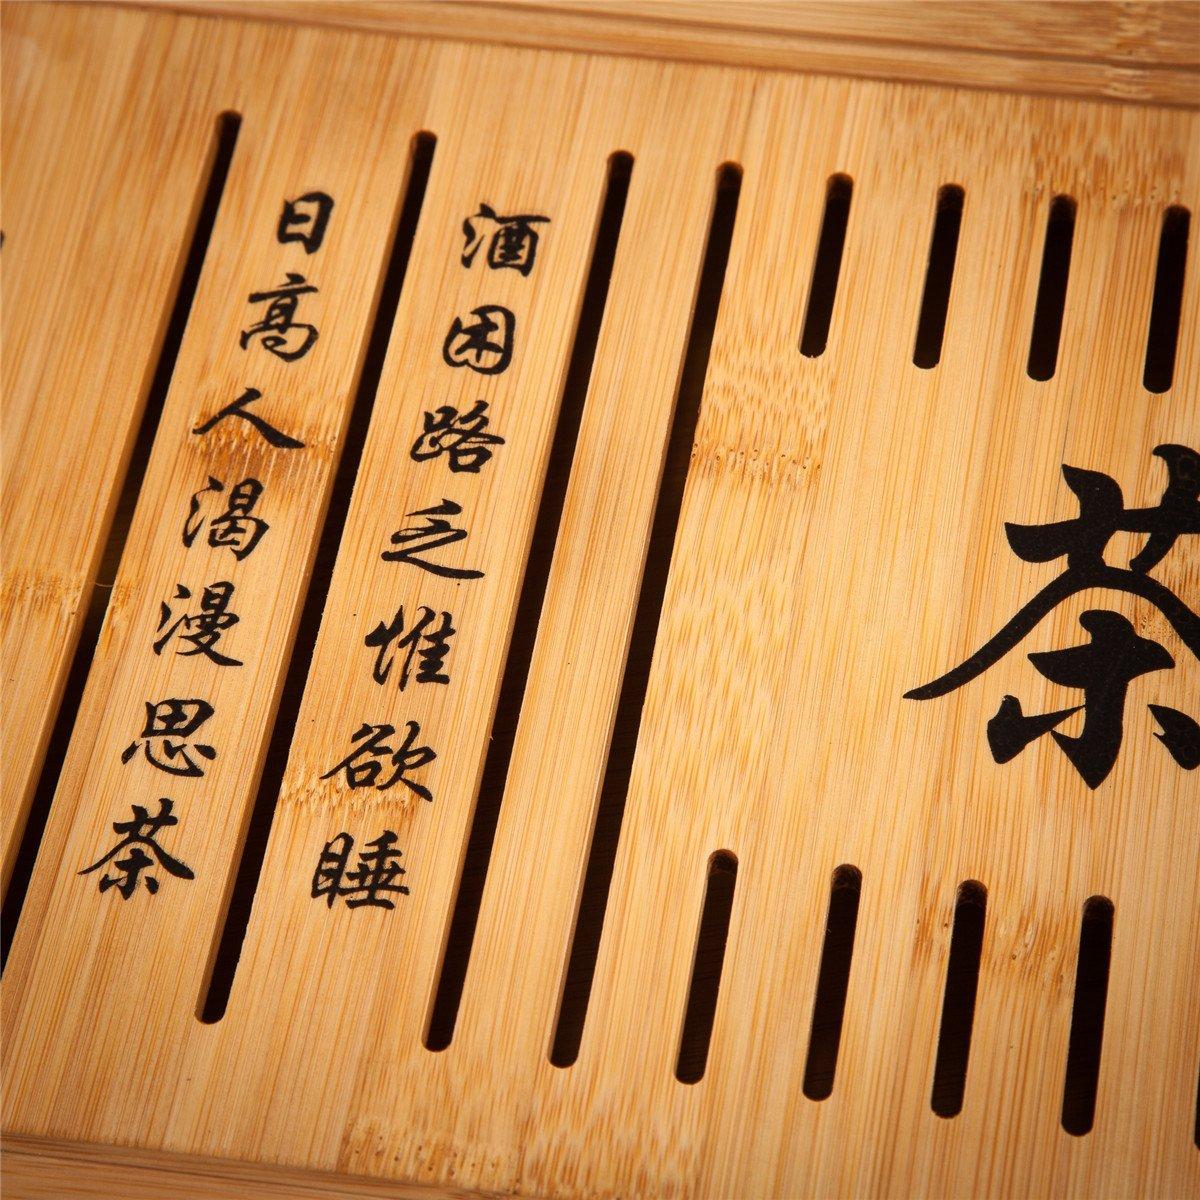 50CM X 30CM X 4.5CM Bamboo Reservoir /& Drainage Type Kung Fu GongFu Tea Table Serving Tray L19.67 x W11.81 x H1.77